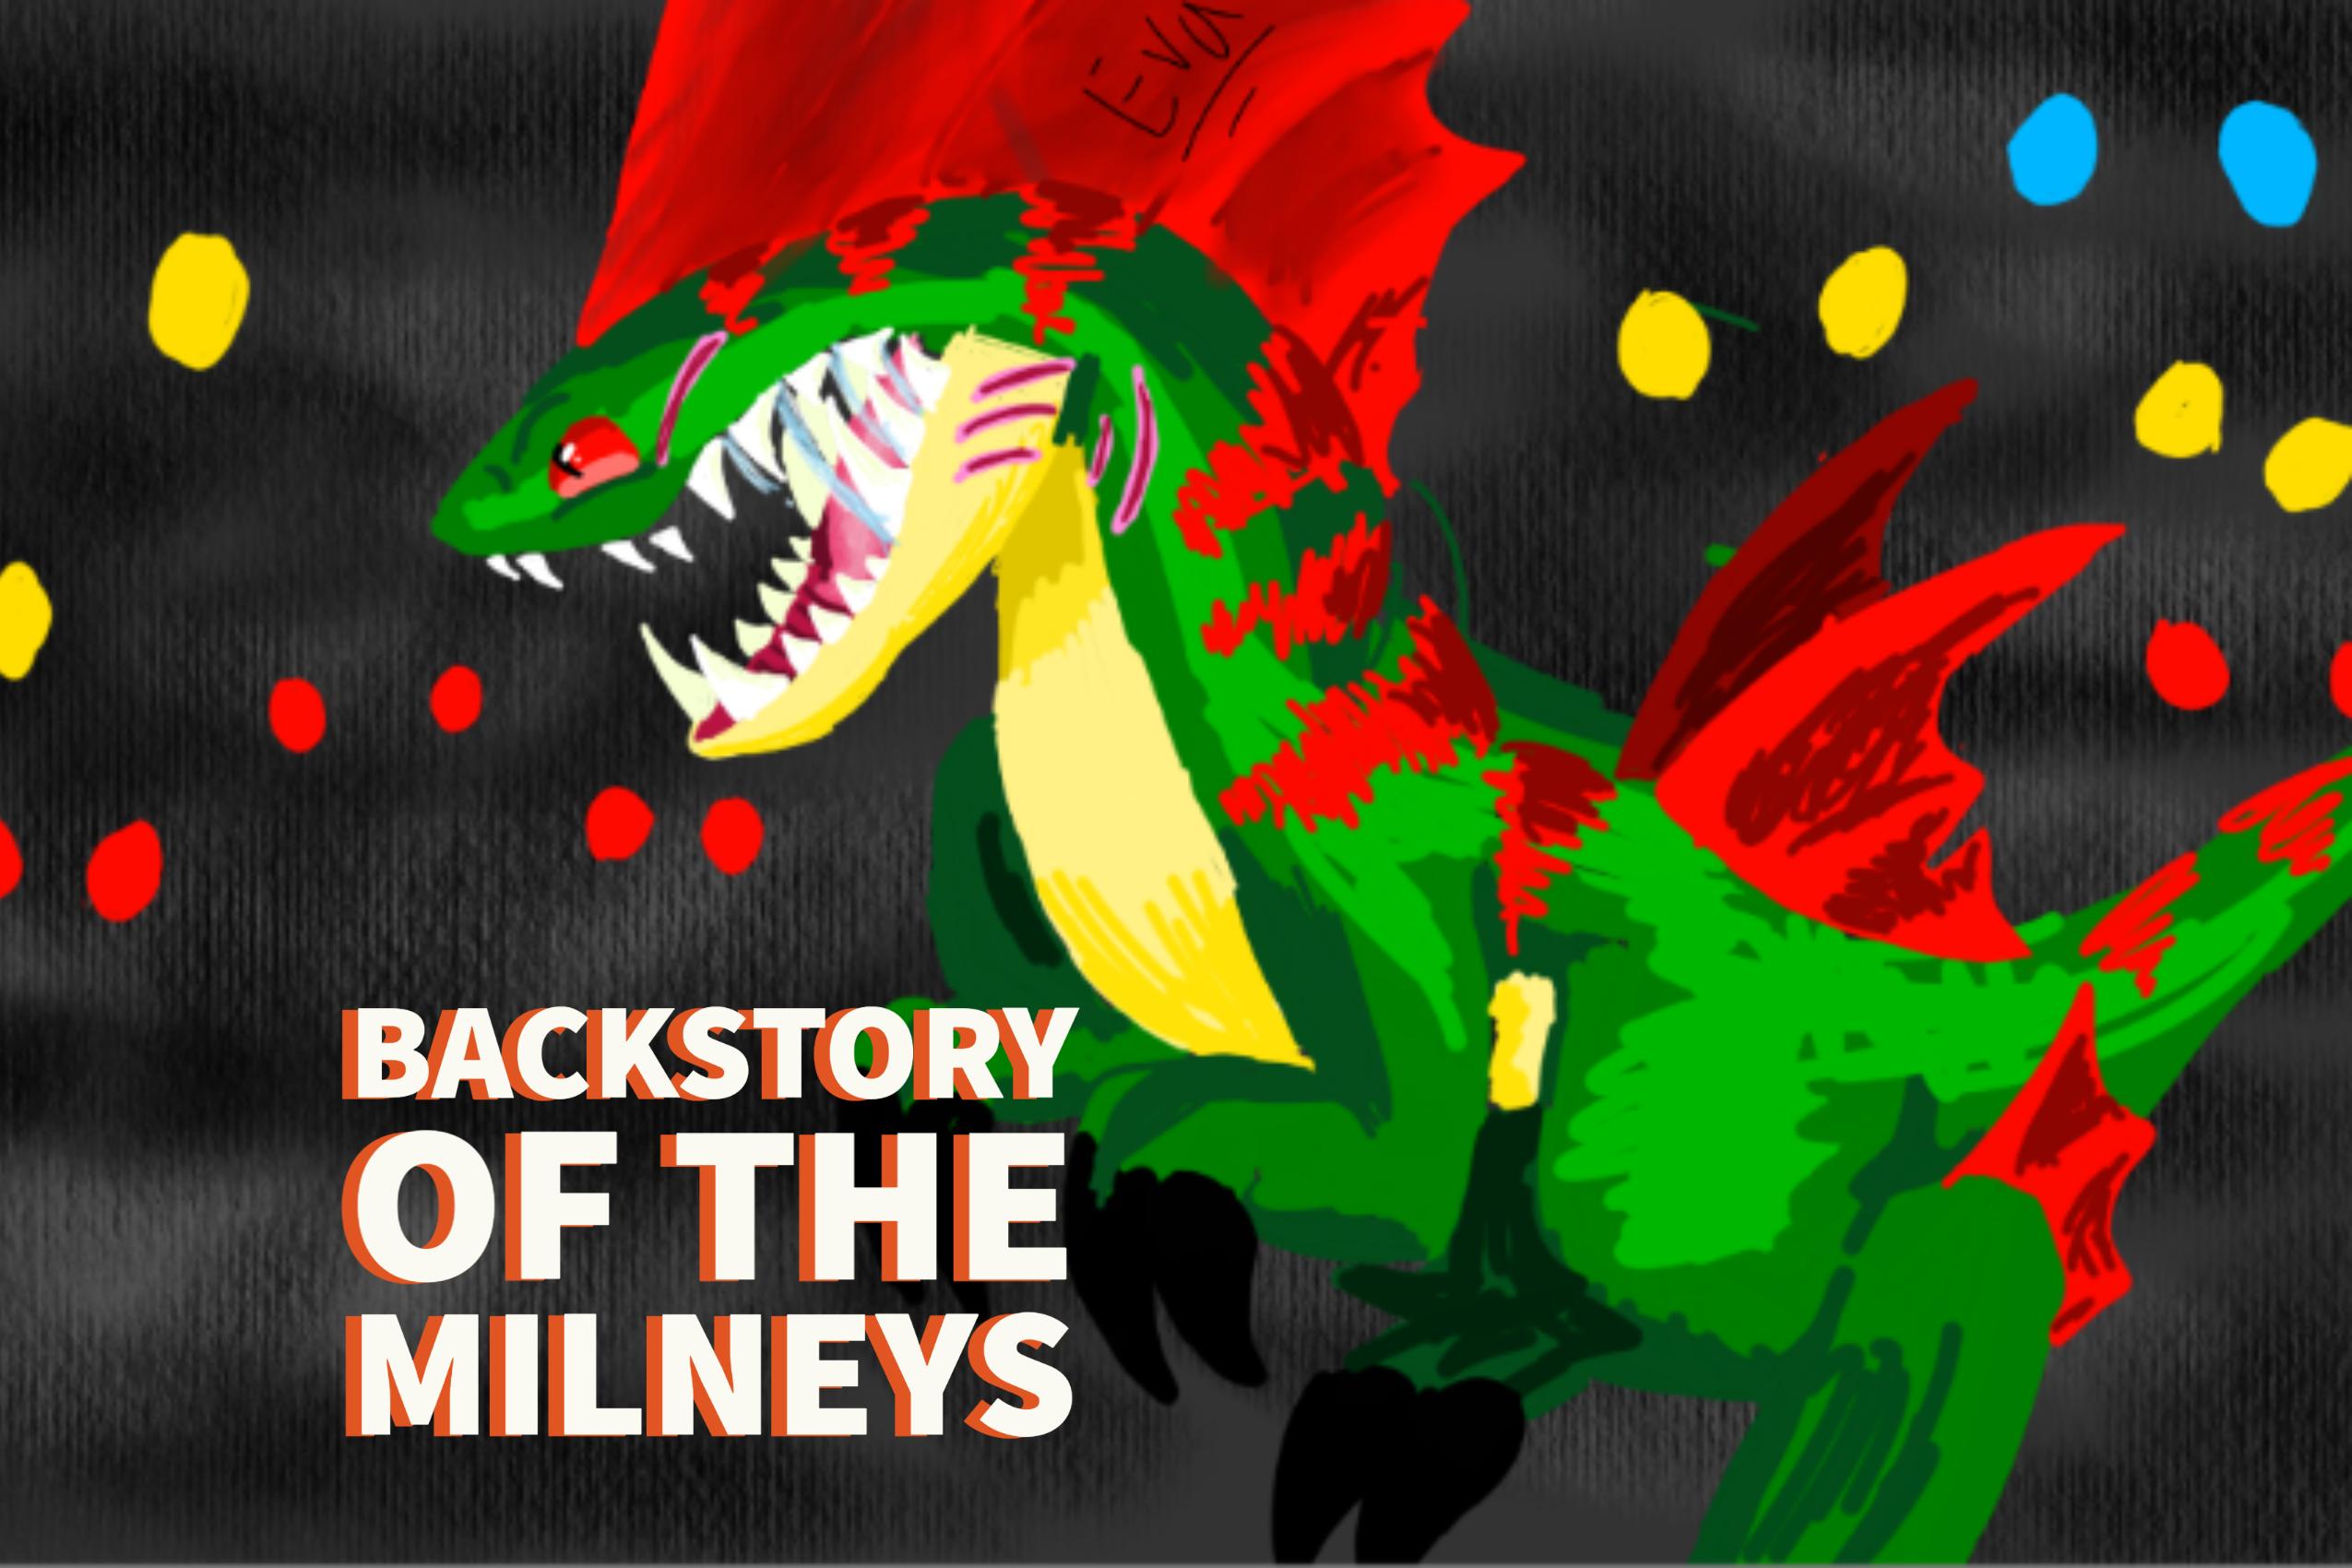 Backstory of The Milneys